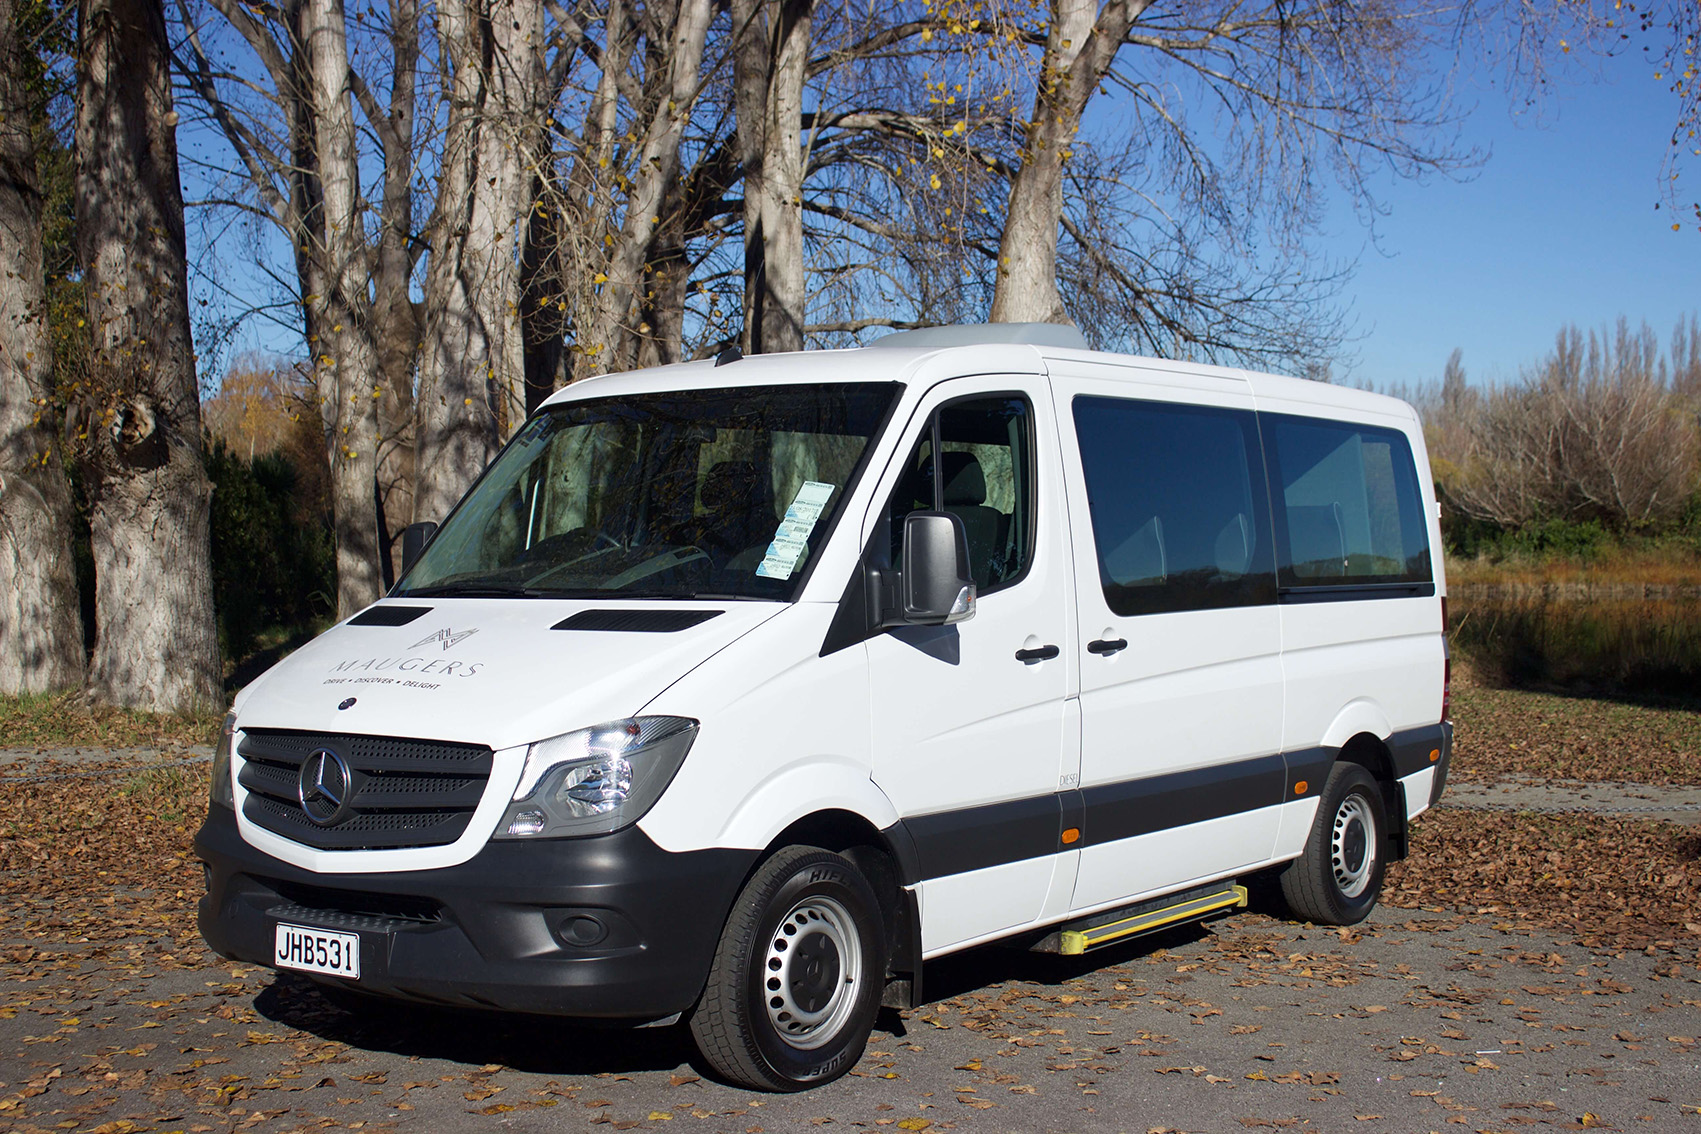 12 Seater Van Rental Minibus Rental Maugers Rentals